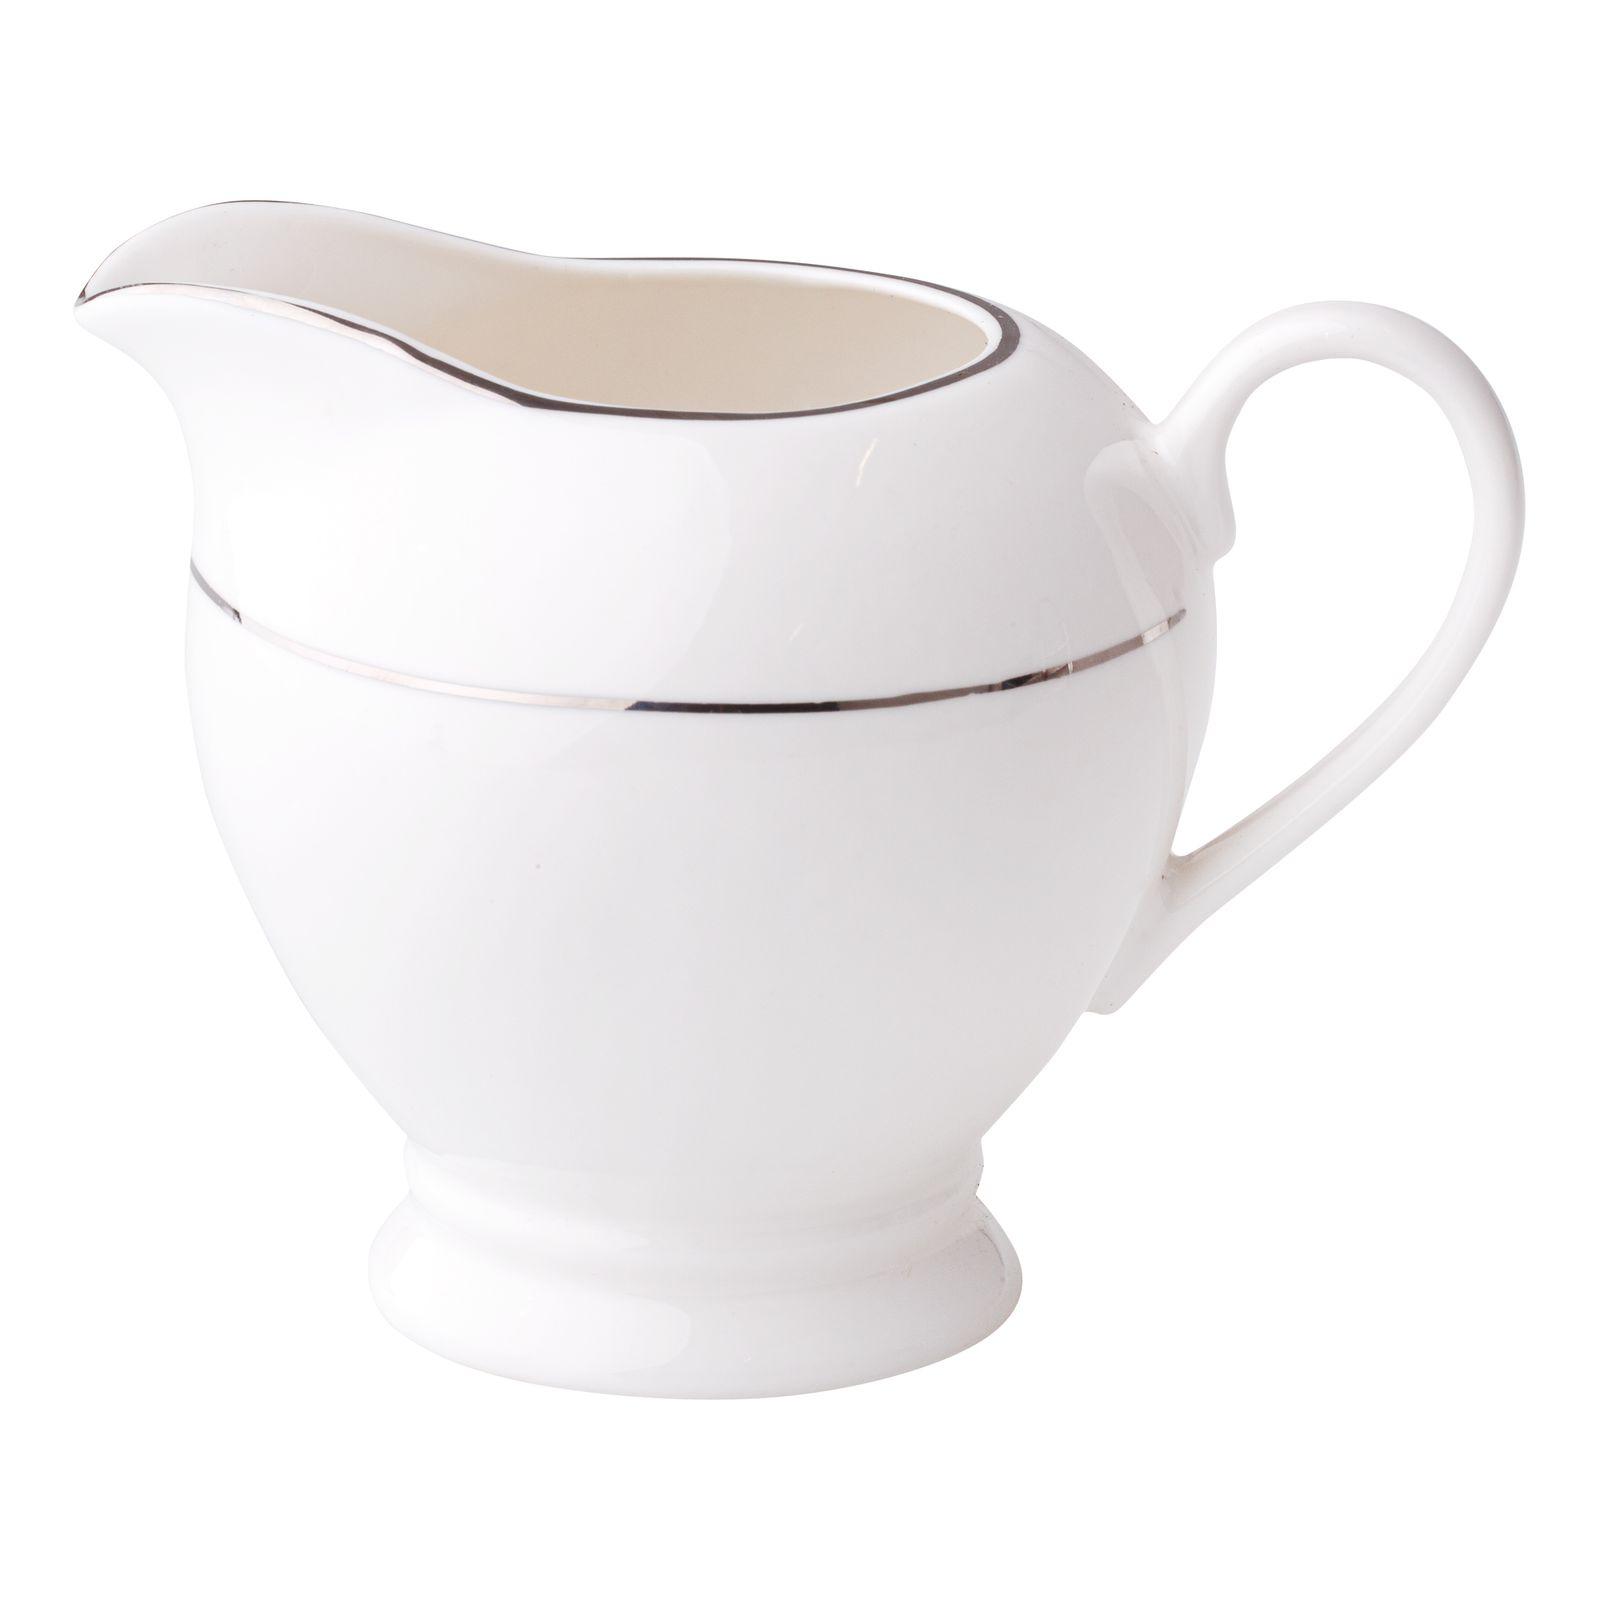 Milchkrug Aura Silver 300 ml AMBITION